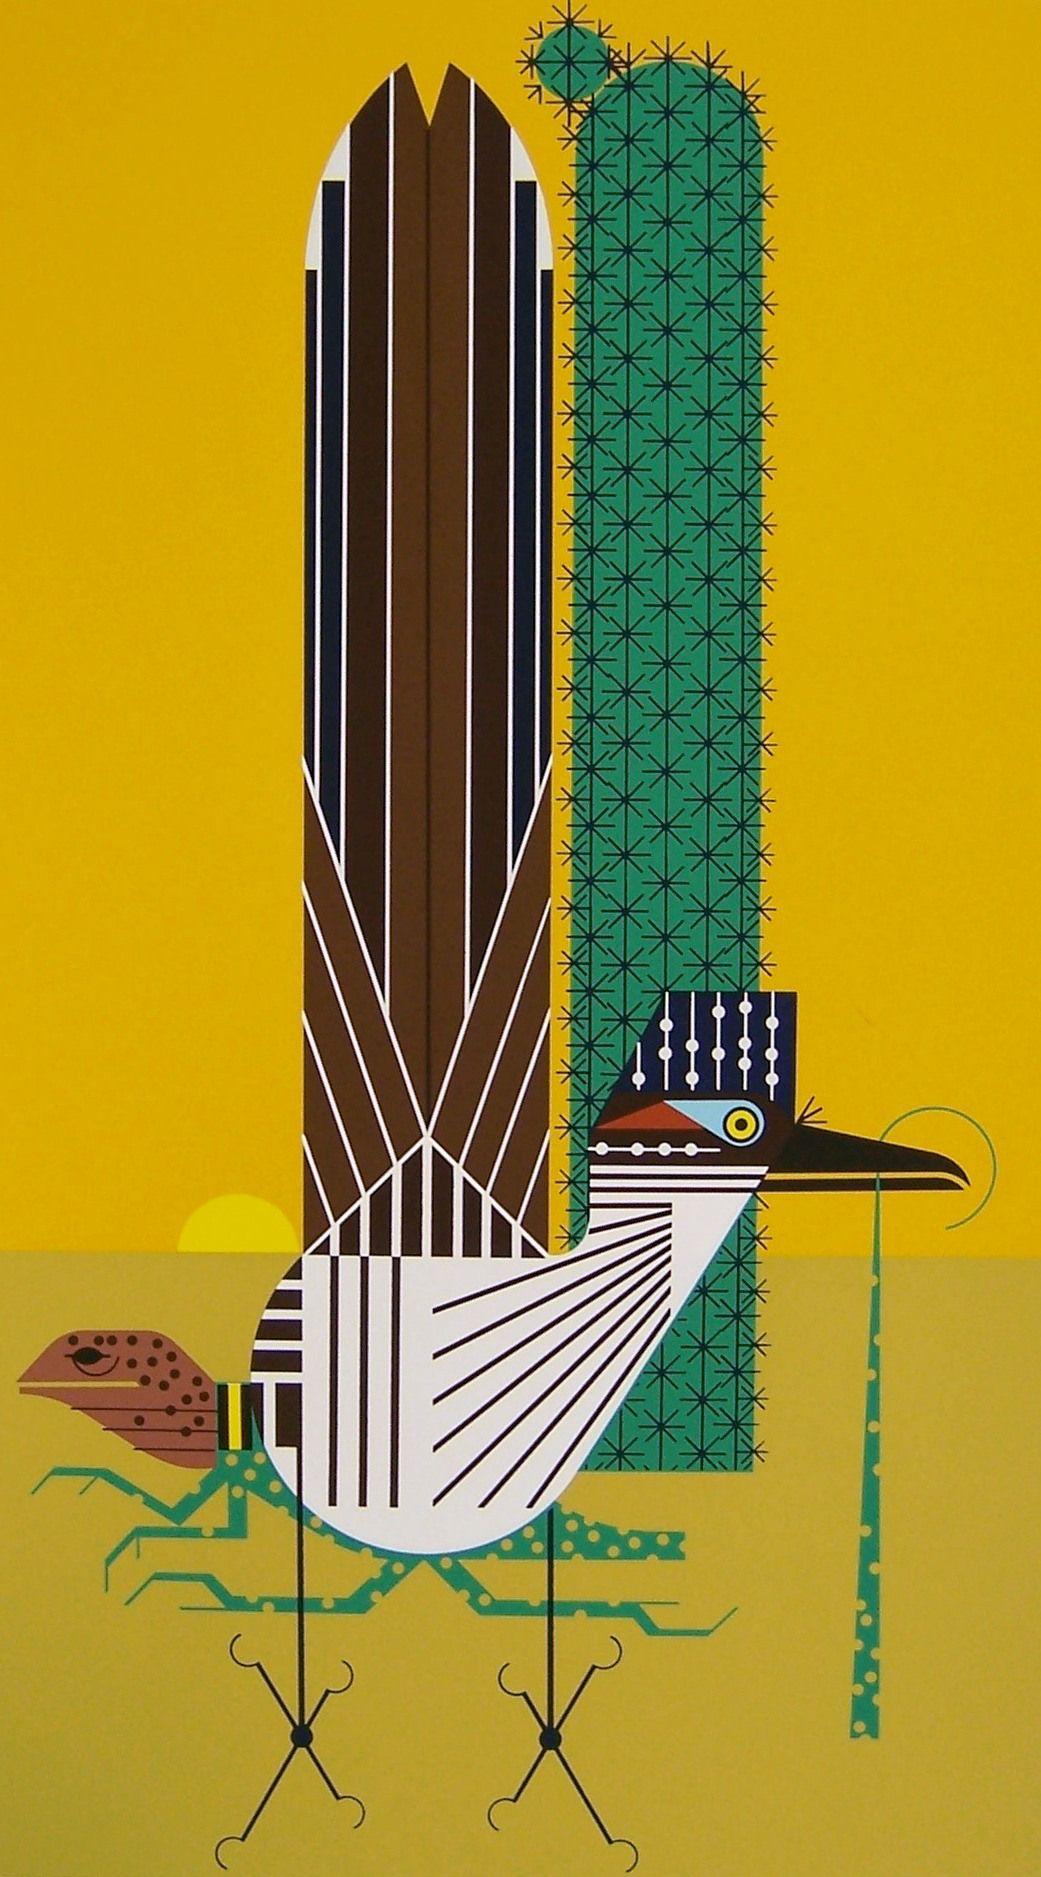 2010 Charley Harper Show at Fabulous Frames & Art   Biología